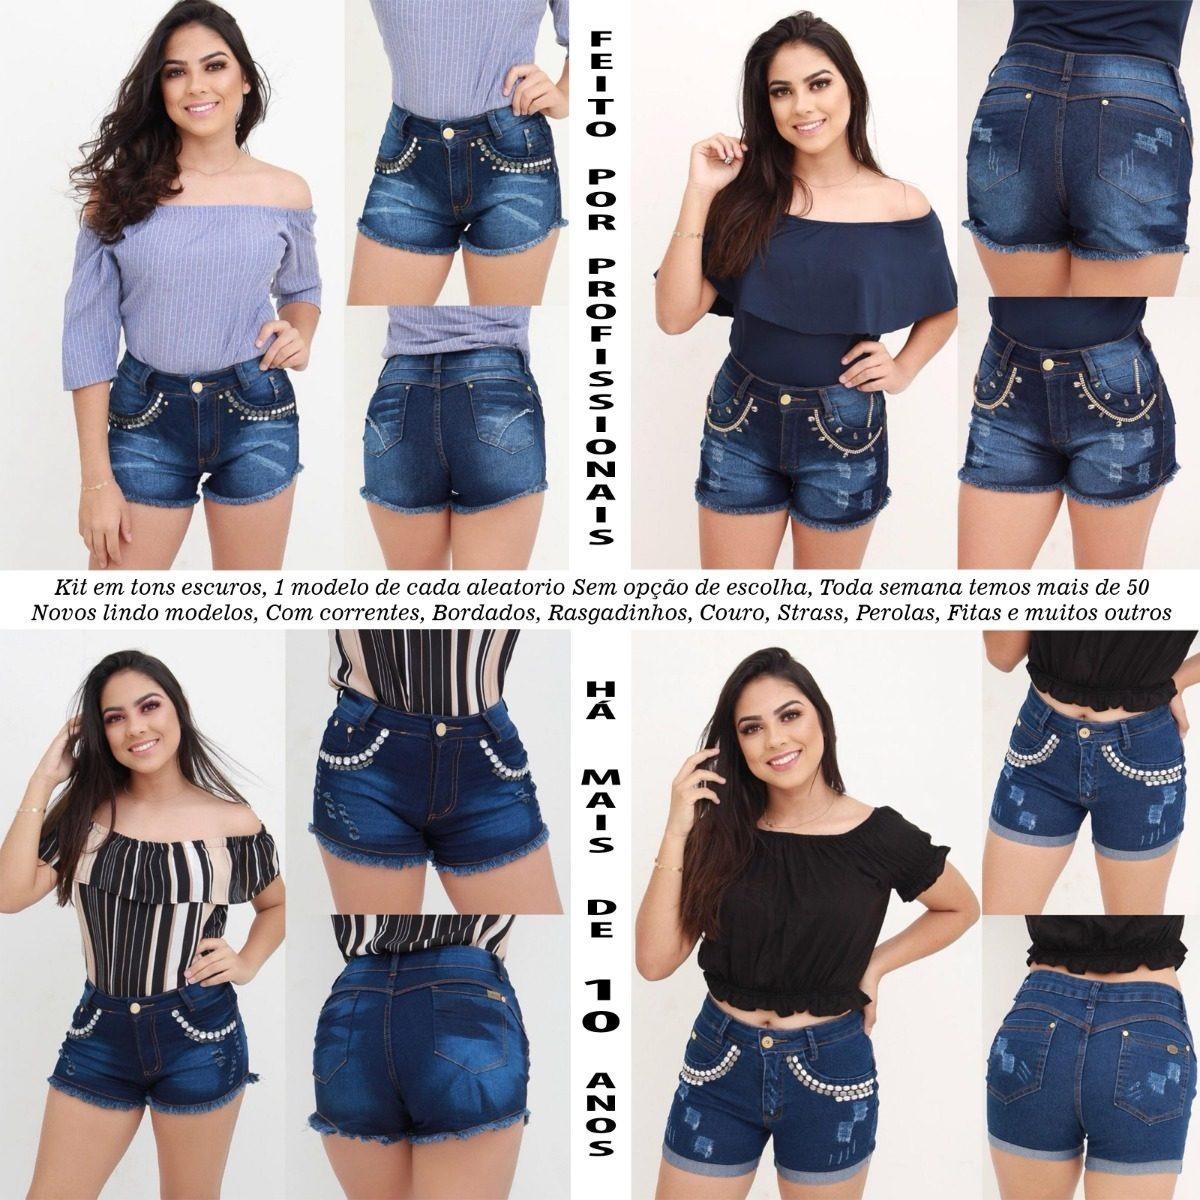 d91286c00c roupas femininas short jeans lycra rasgo pedras unli  shpm20. Carregando  zoom.